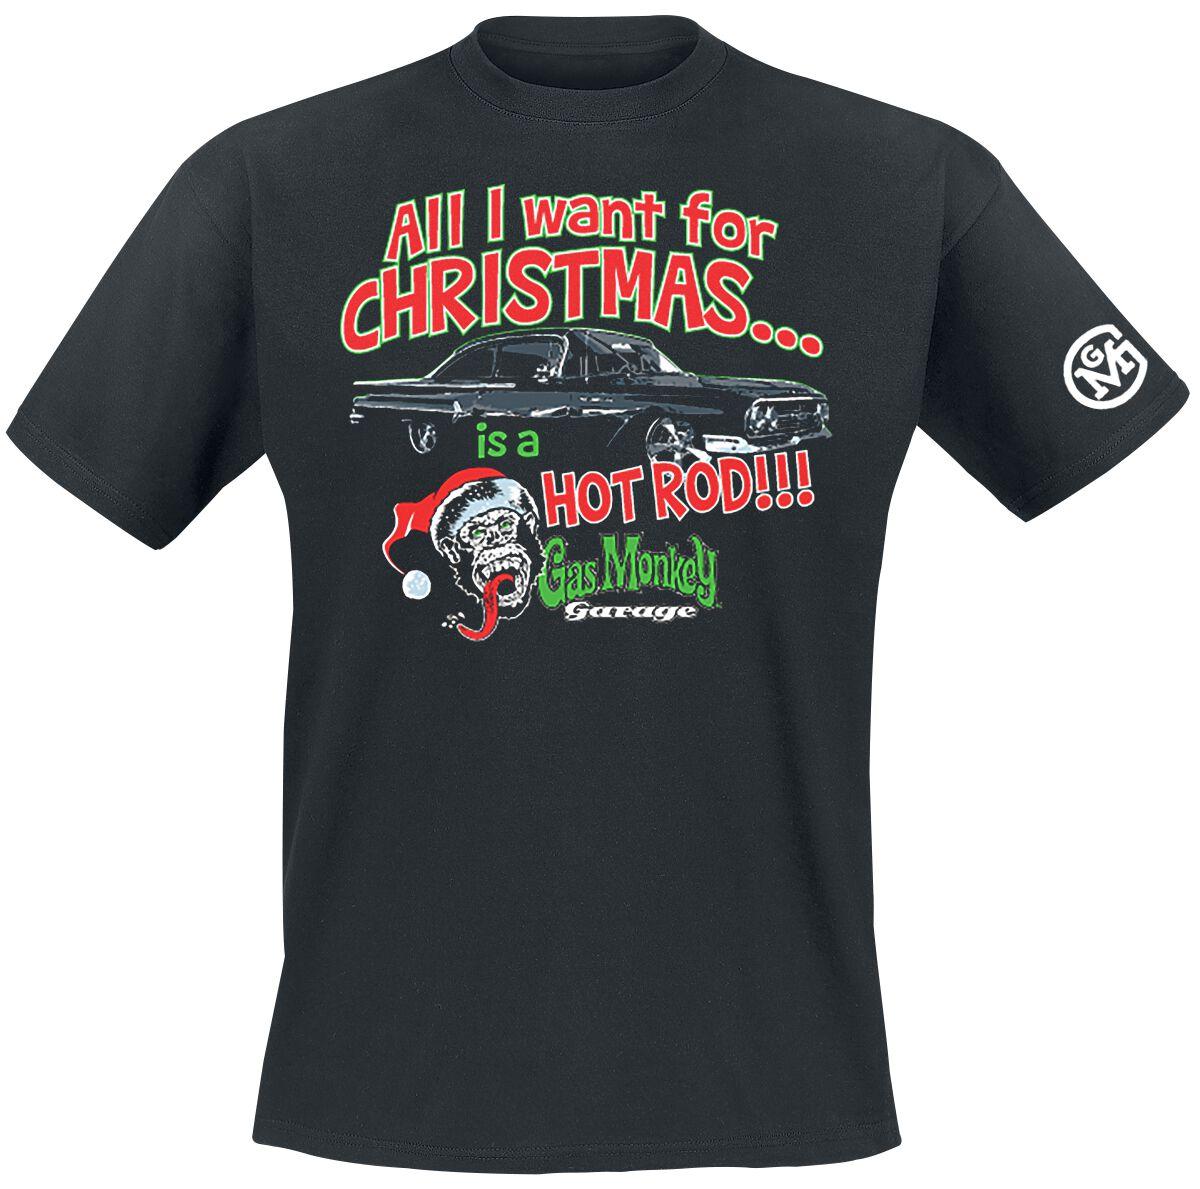 Merch dla Fanów - Koszulki - T-Shirt Gas Monkey Garage All I Want For Christmas T-Shirt czarny - 370836